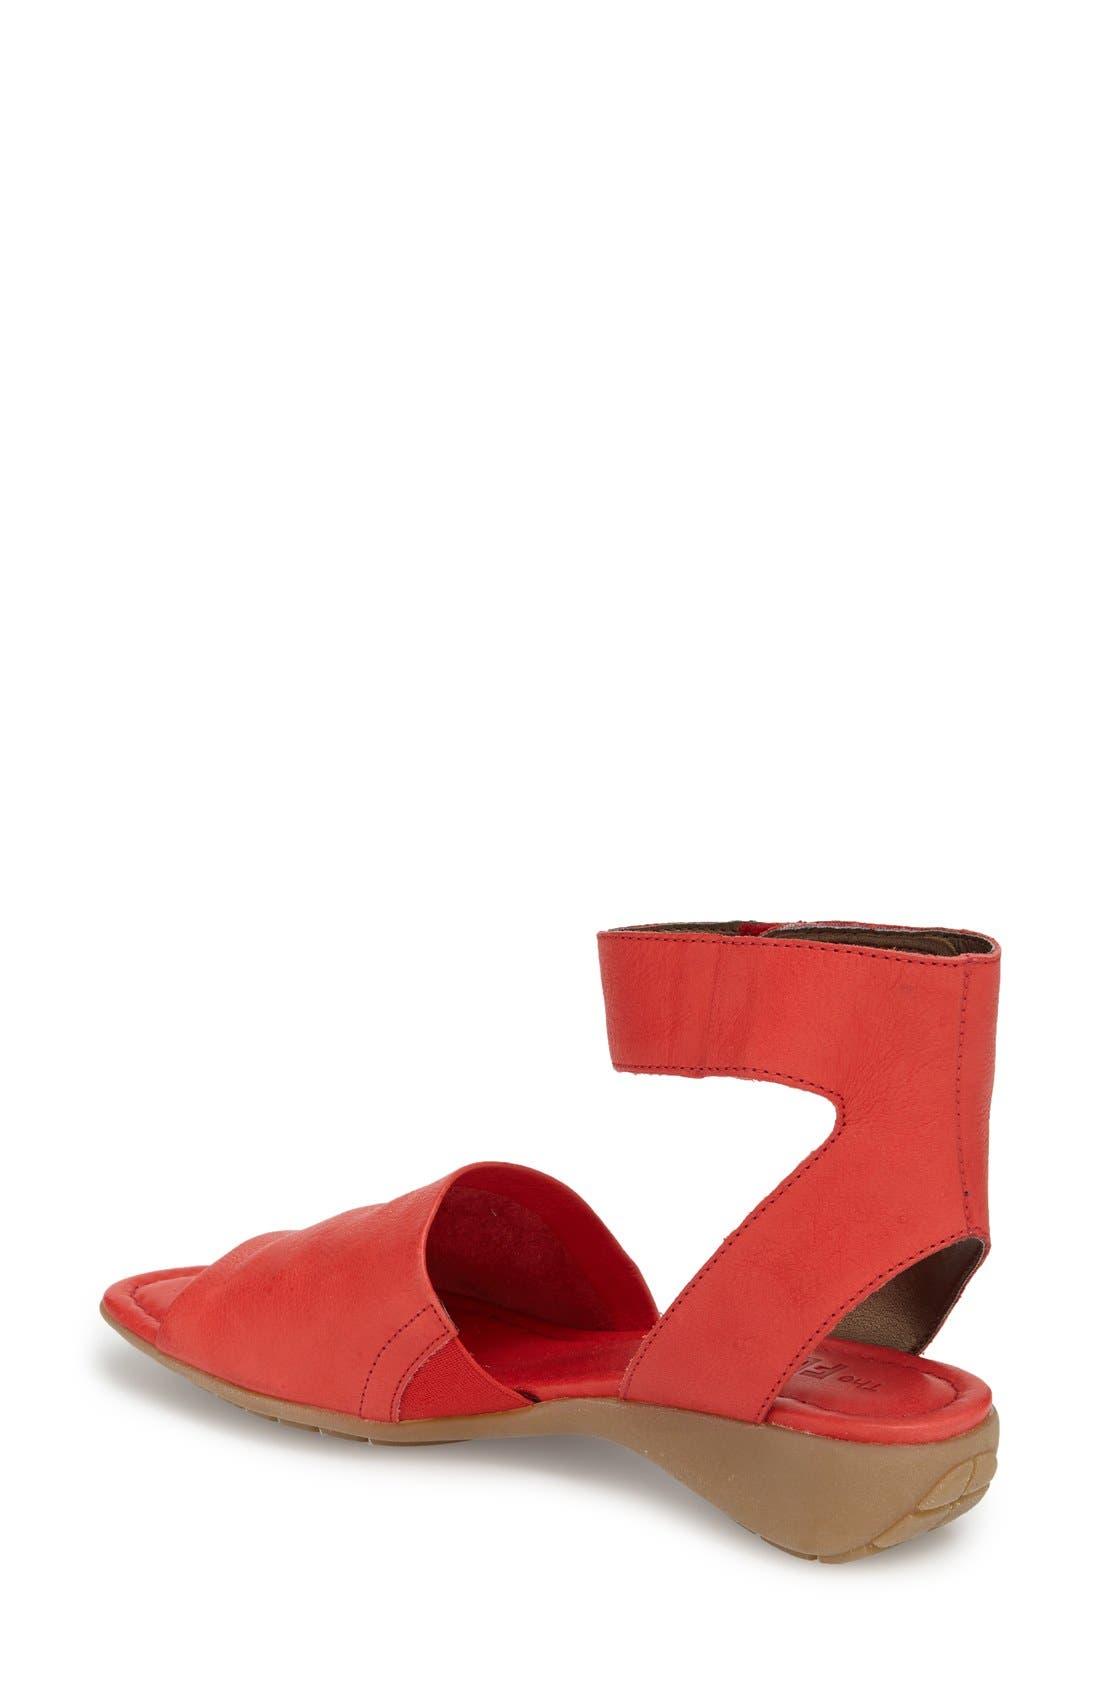 'Beglad' Leather Ankle Strap Sandal,                             Alternate thumbnail 32, color,